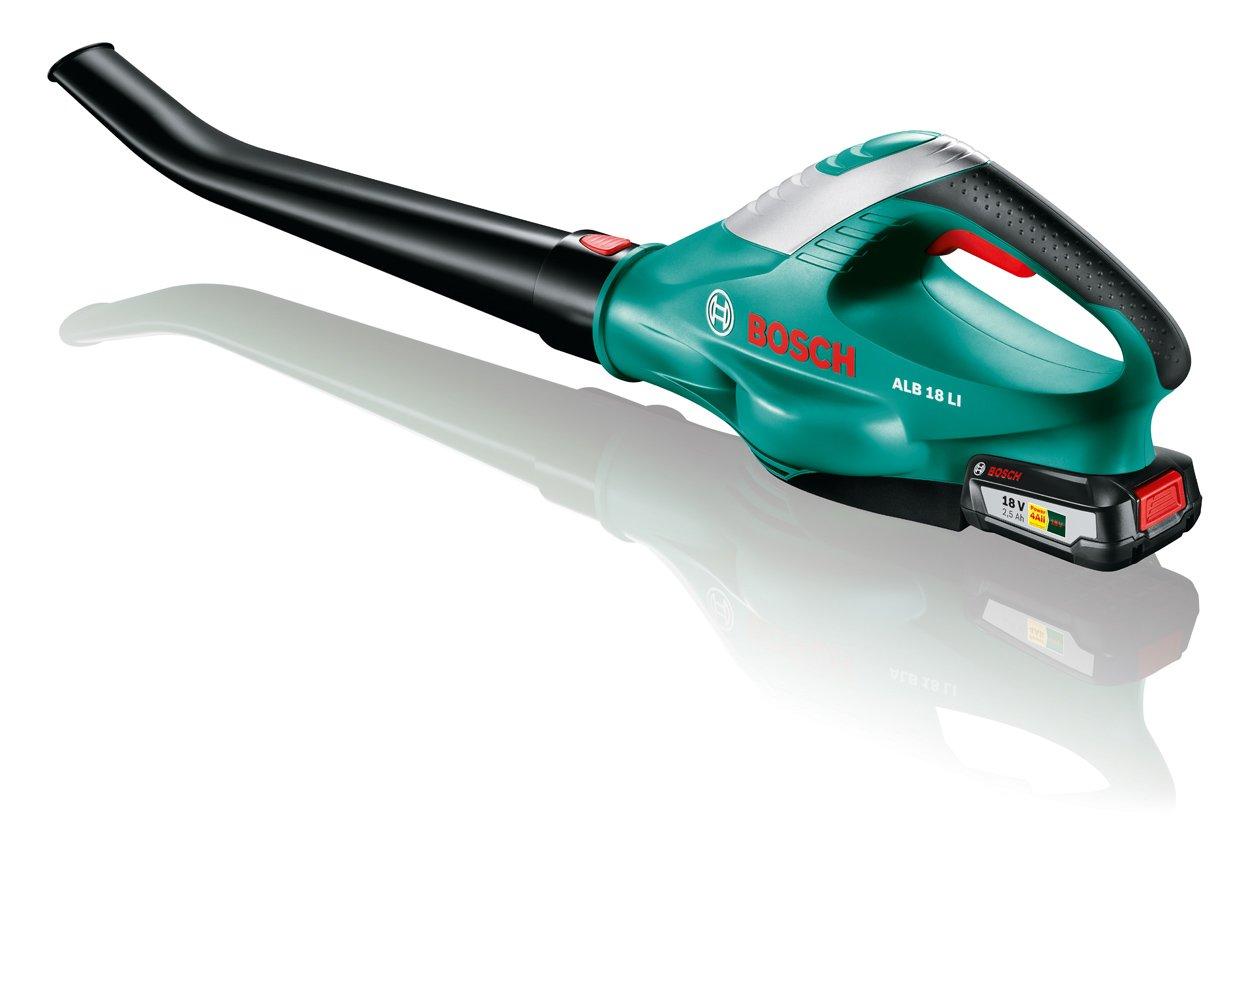 Bosch DIY Akku-Laubbläser ALB 18 LI, Akku, Ladegerät, Karton ( Ladezeit 60 Min, Laufzeit 17 Min, Max. Gebläsegeschwindigkeit 210 km/h)